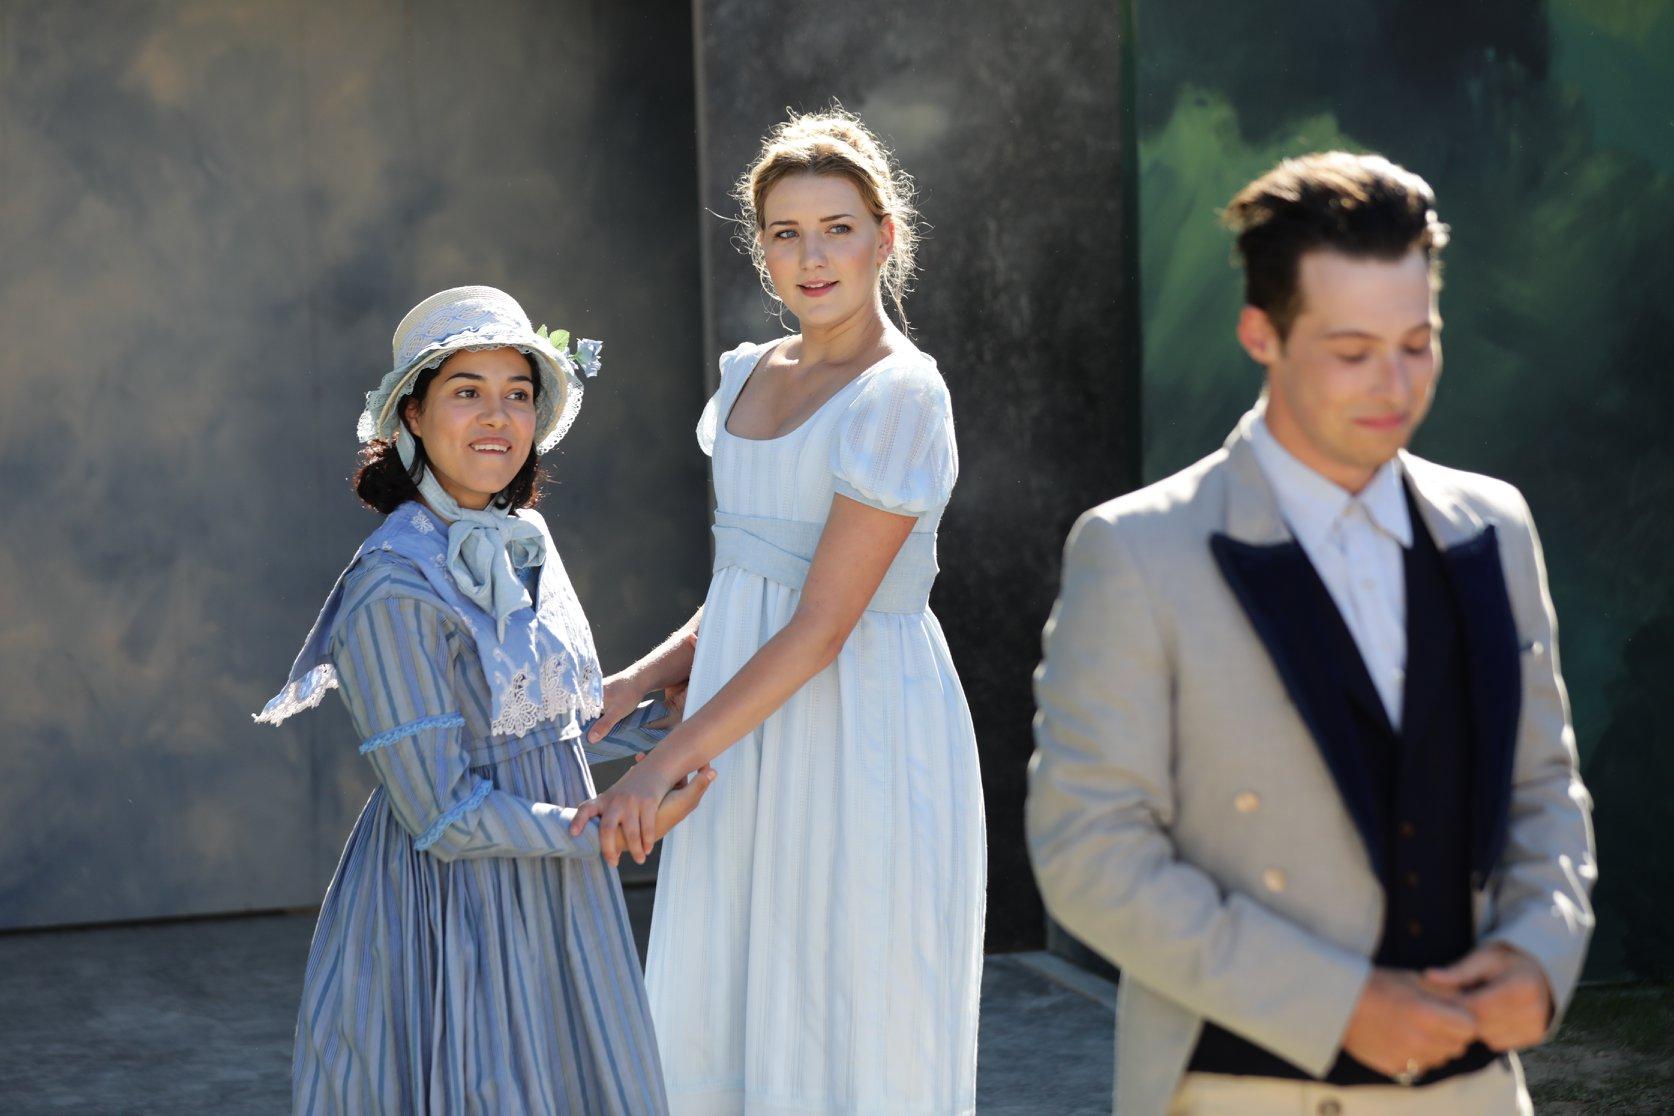 Madison McKenzie Scott as Elinor Dashwood in Sense & Sensibility at Island Shakespeare Festival. Photo by Michael Stadler